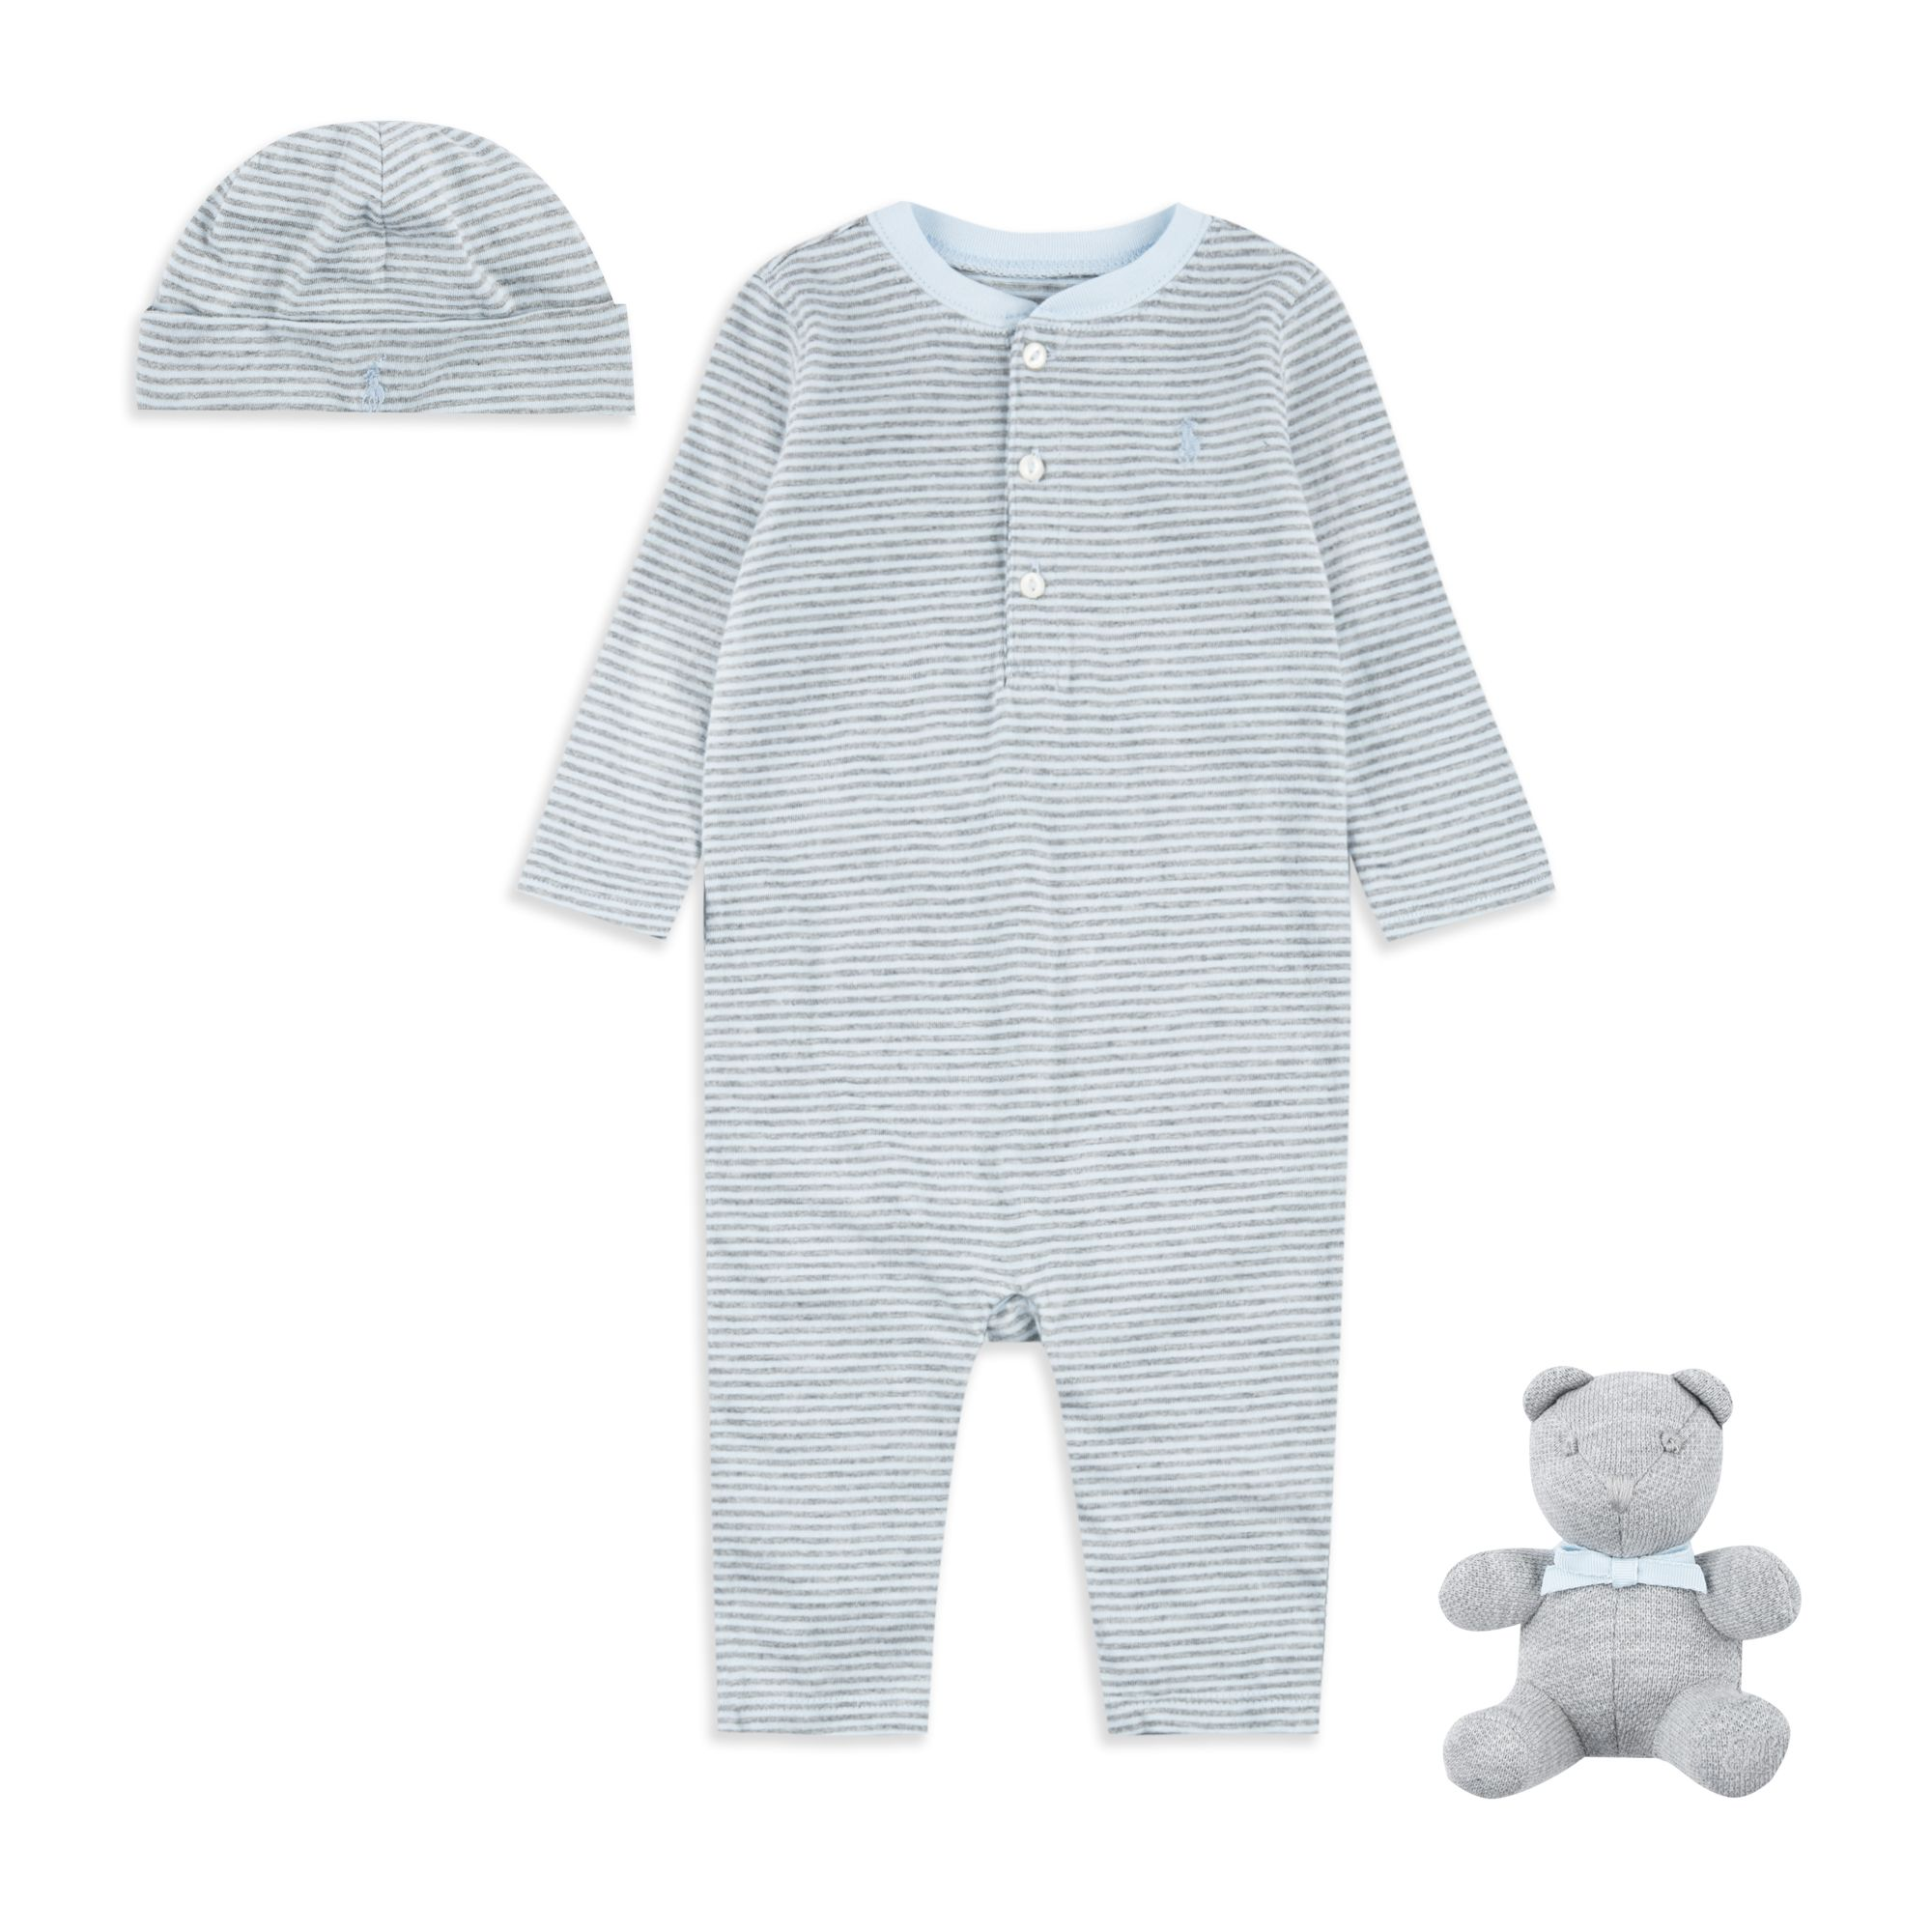 fcdfba6ae480 RALPH LAUREN Baby Boys Babygrow Gift Box Set - Blue Baby boys gift set •  Soft